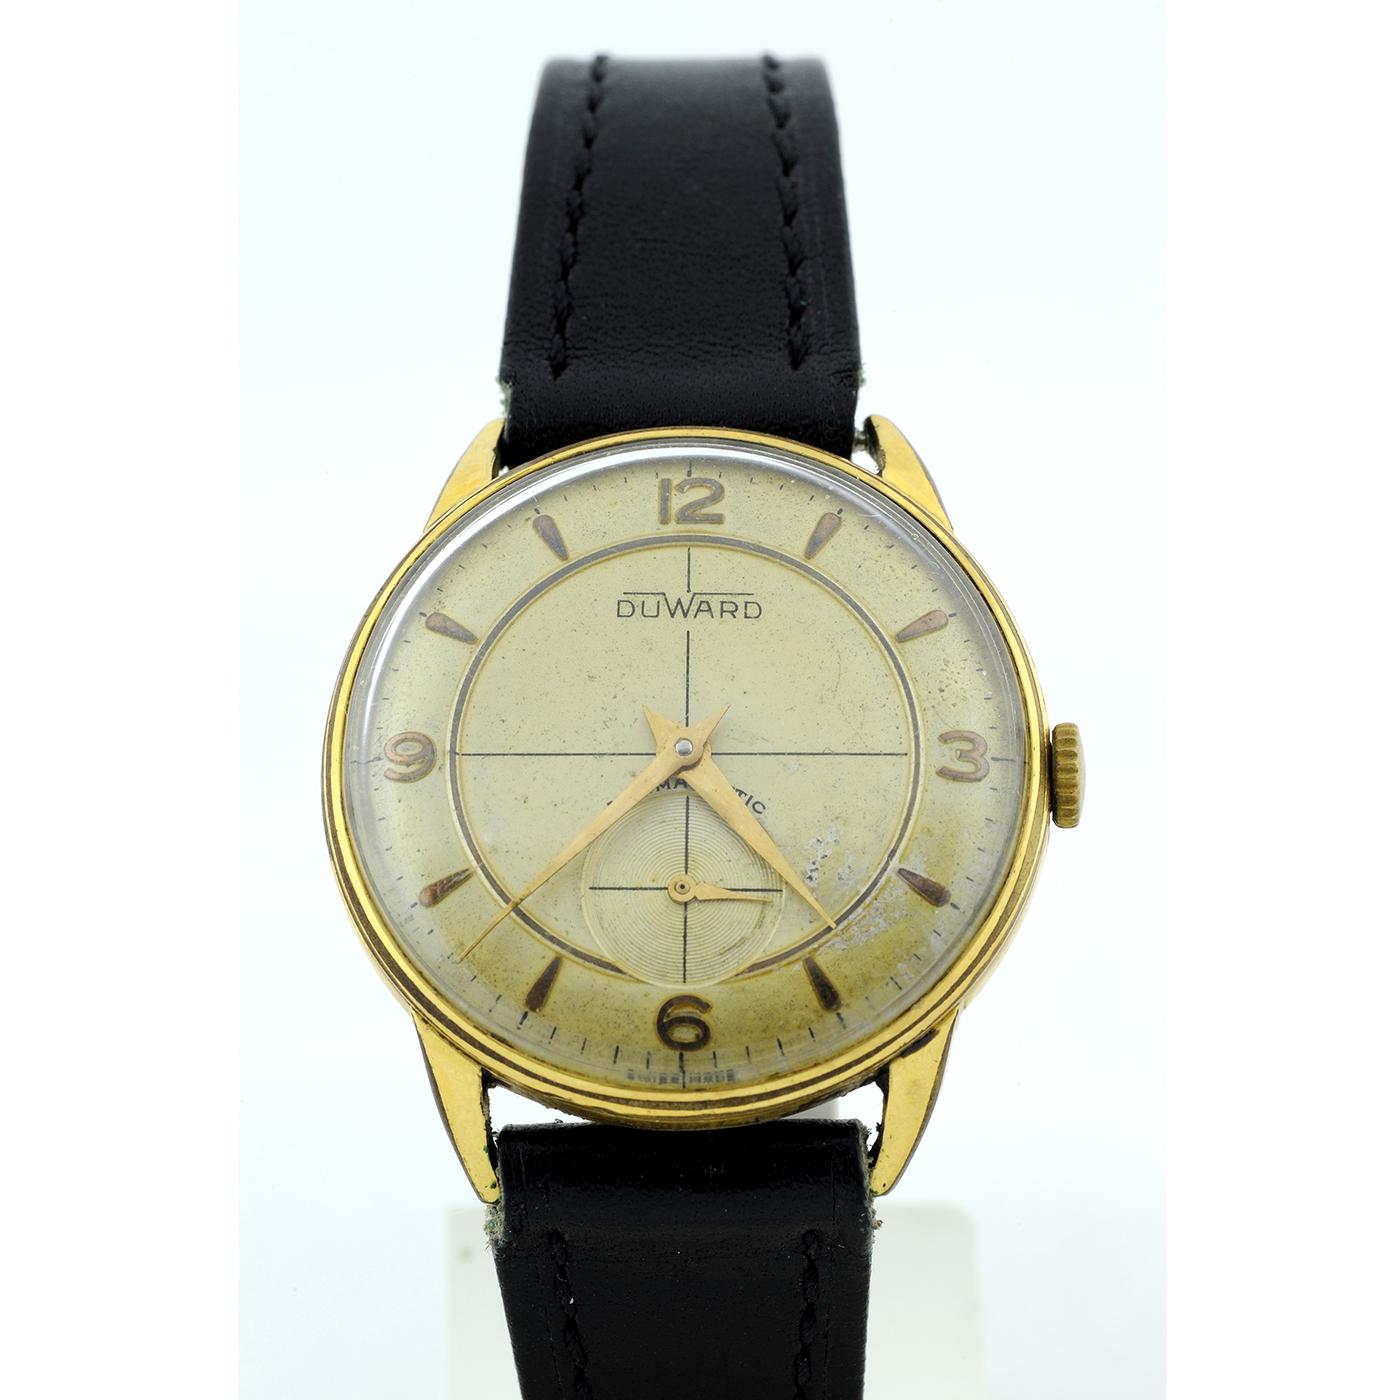 DUWARD. Reloj para dama-cadete de pulsera. Ca. 1960.